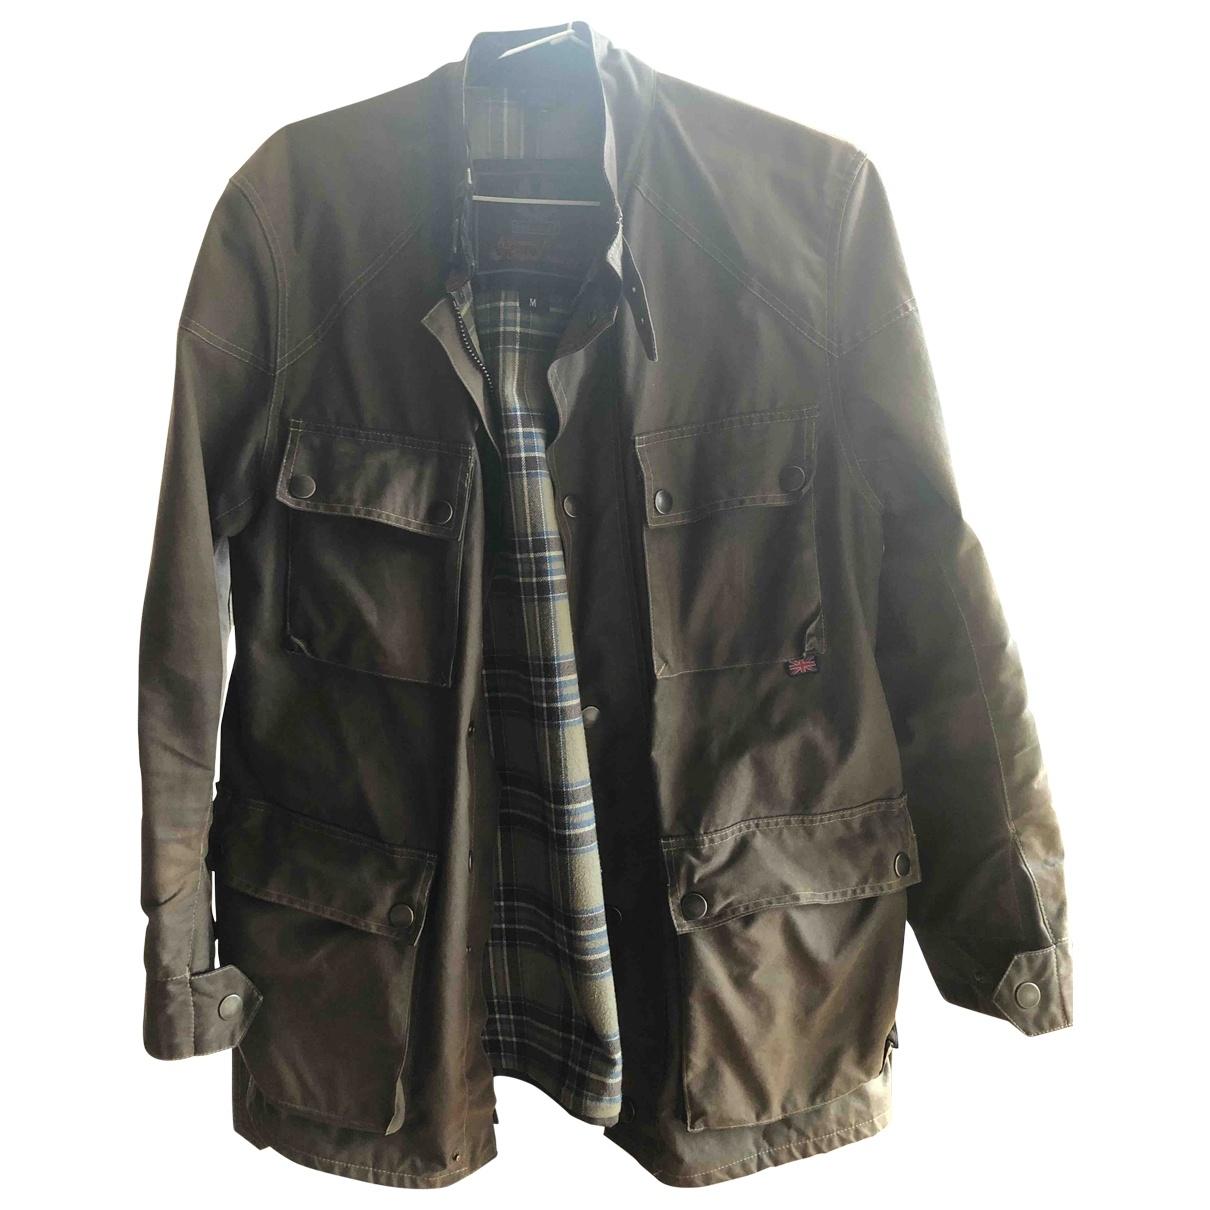 Belstaff \N Khaki jacket  for Men M International